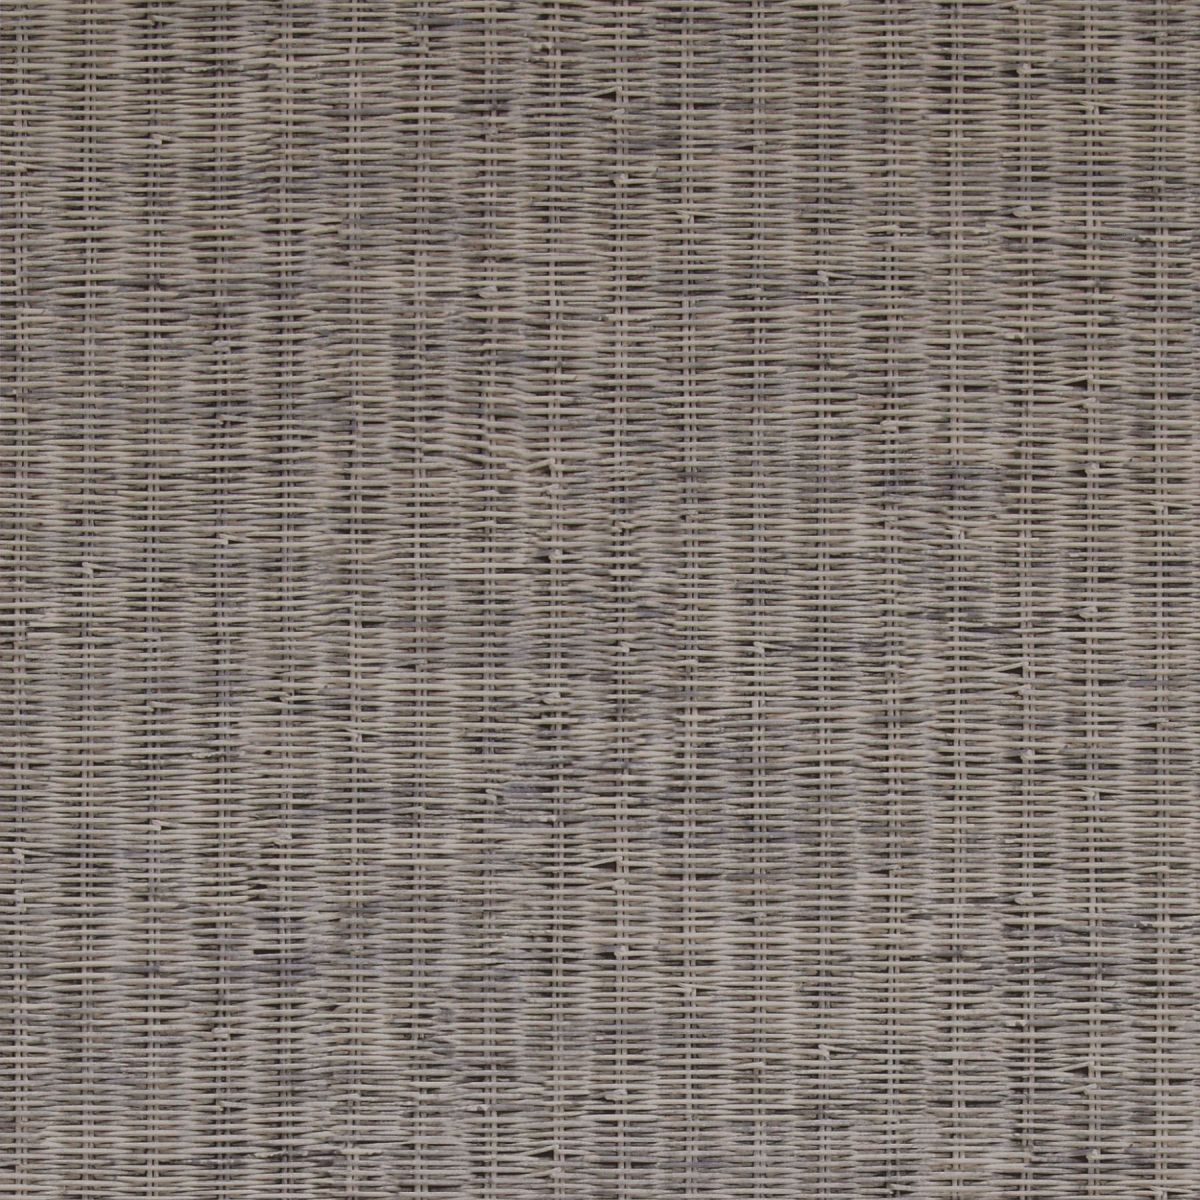 hochwertige tapeten und stoffe b n wallcoverings vliestapete riviera maison 18333 decowunder. Black Bedroom Furniture Sets. Home Design Ideas